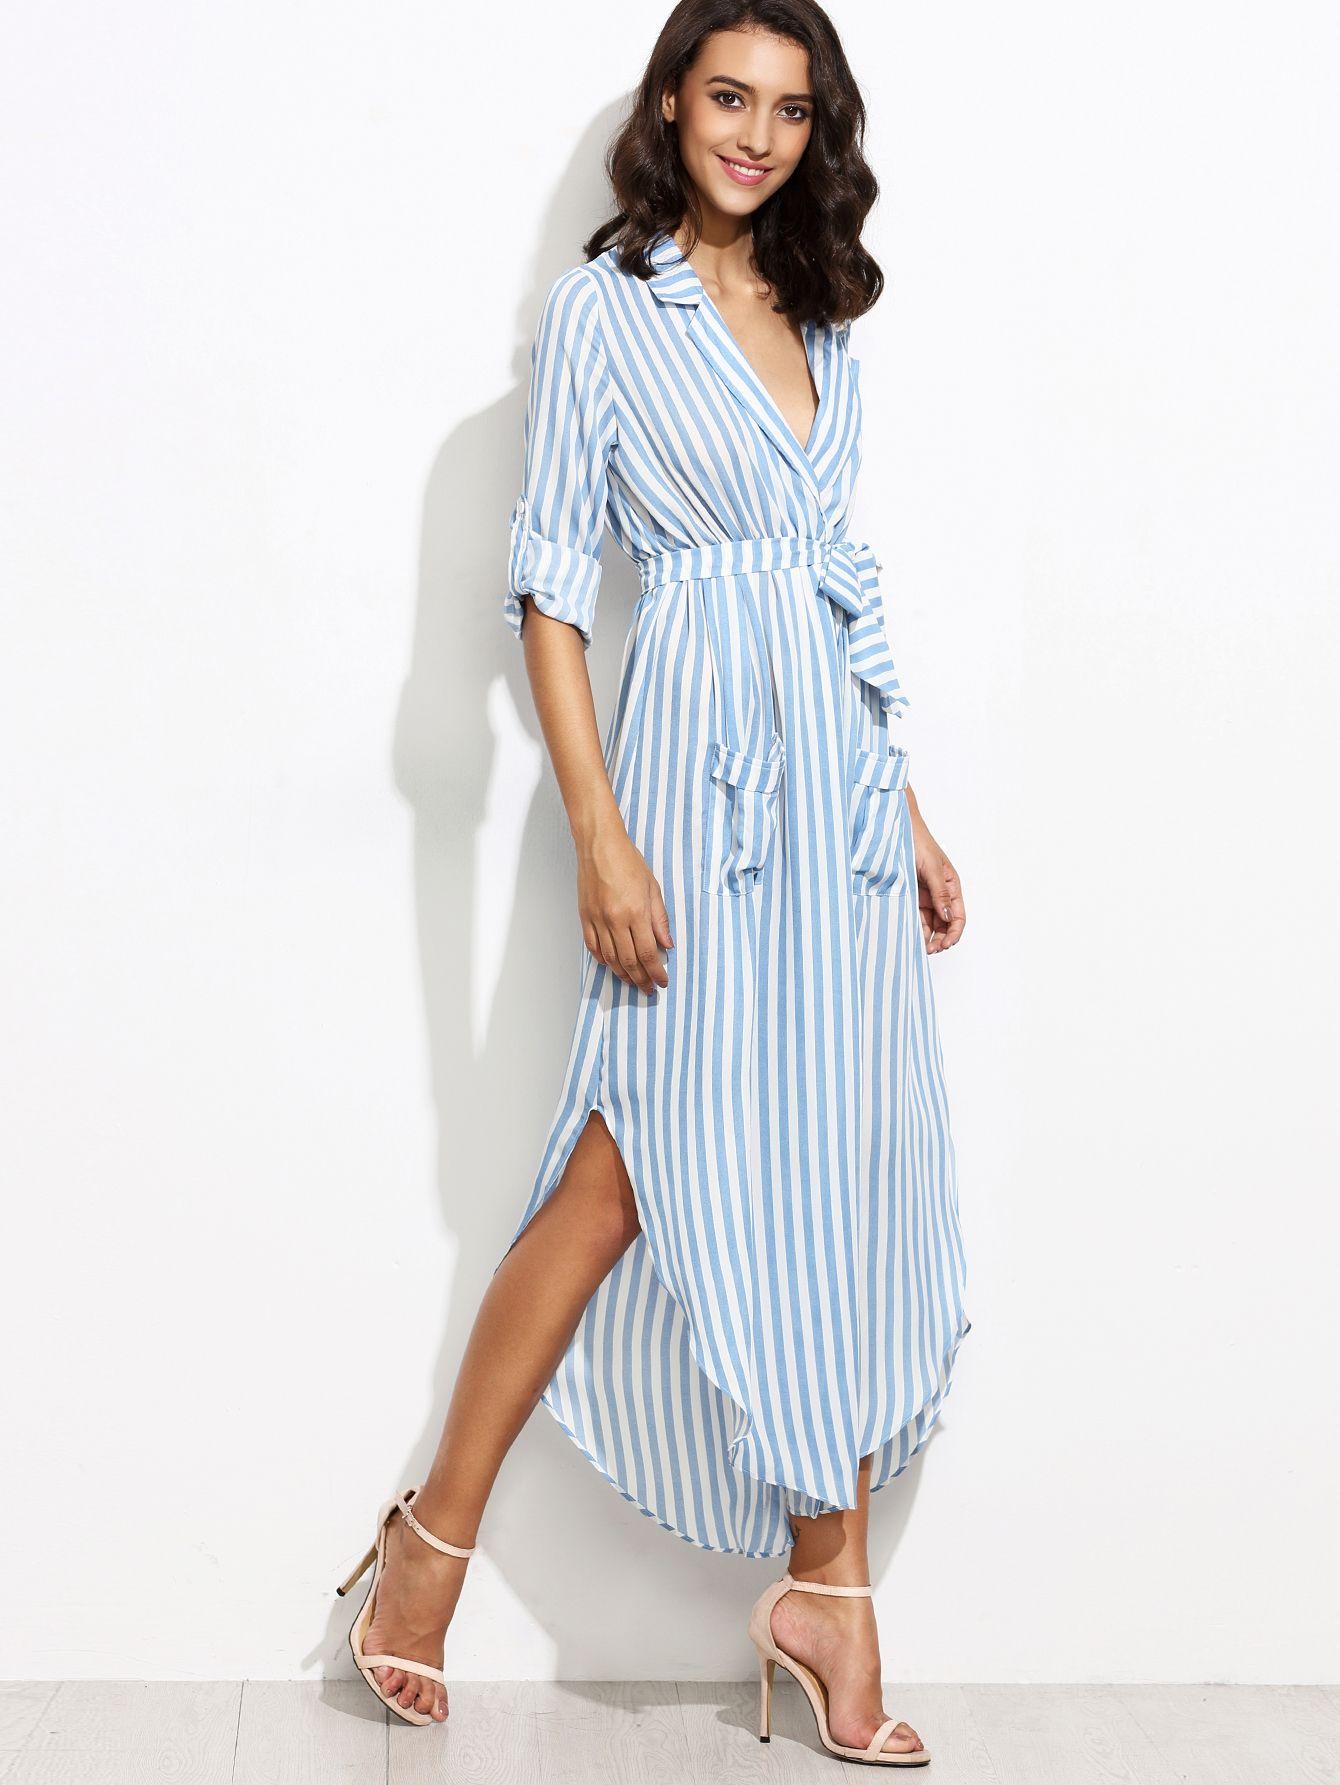 f9f328be79 Shop Contrast Vertical Striped Self Tie Shirt Dress online. SheIn ...